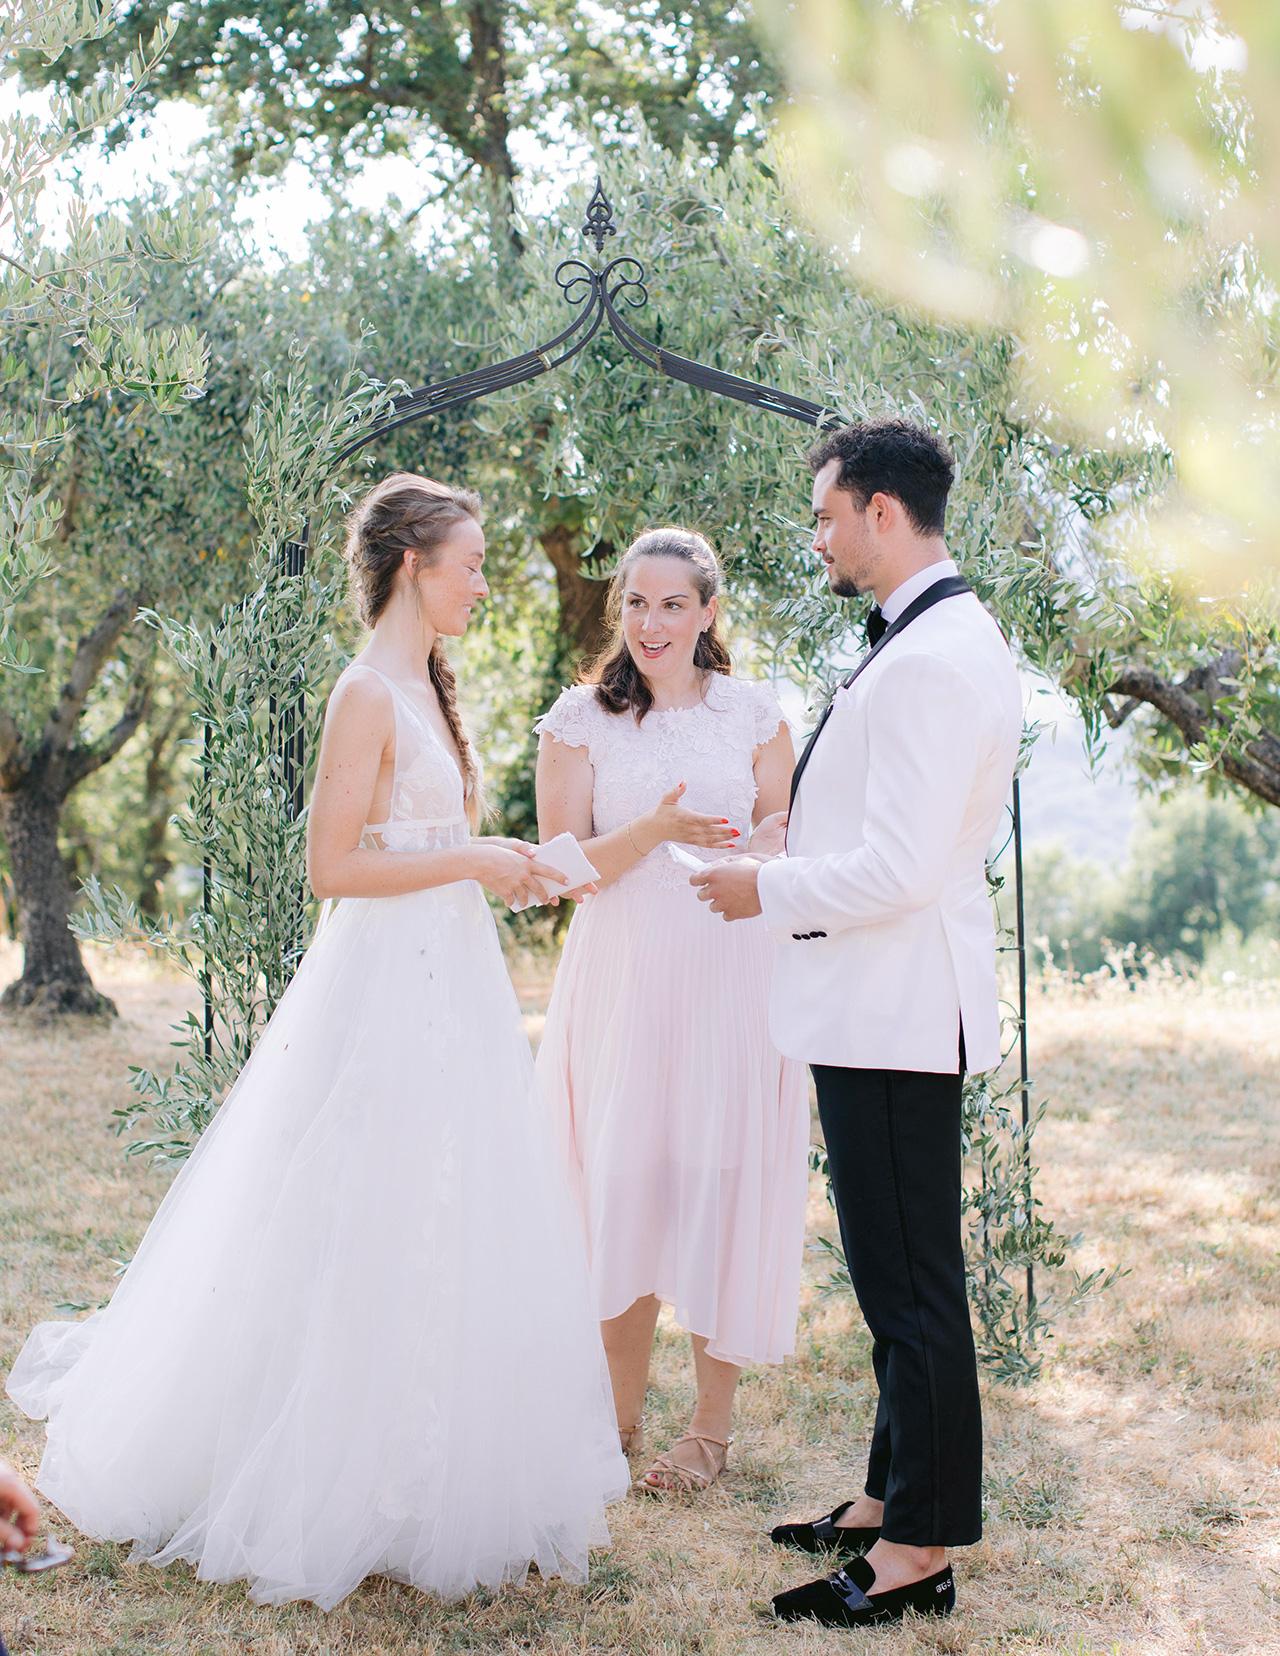 bride groom wedding vow exchange friend officiant